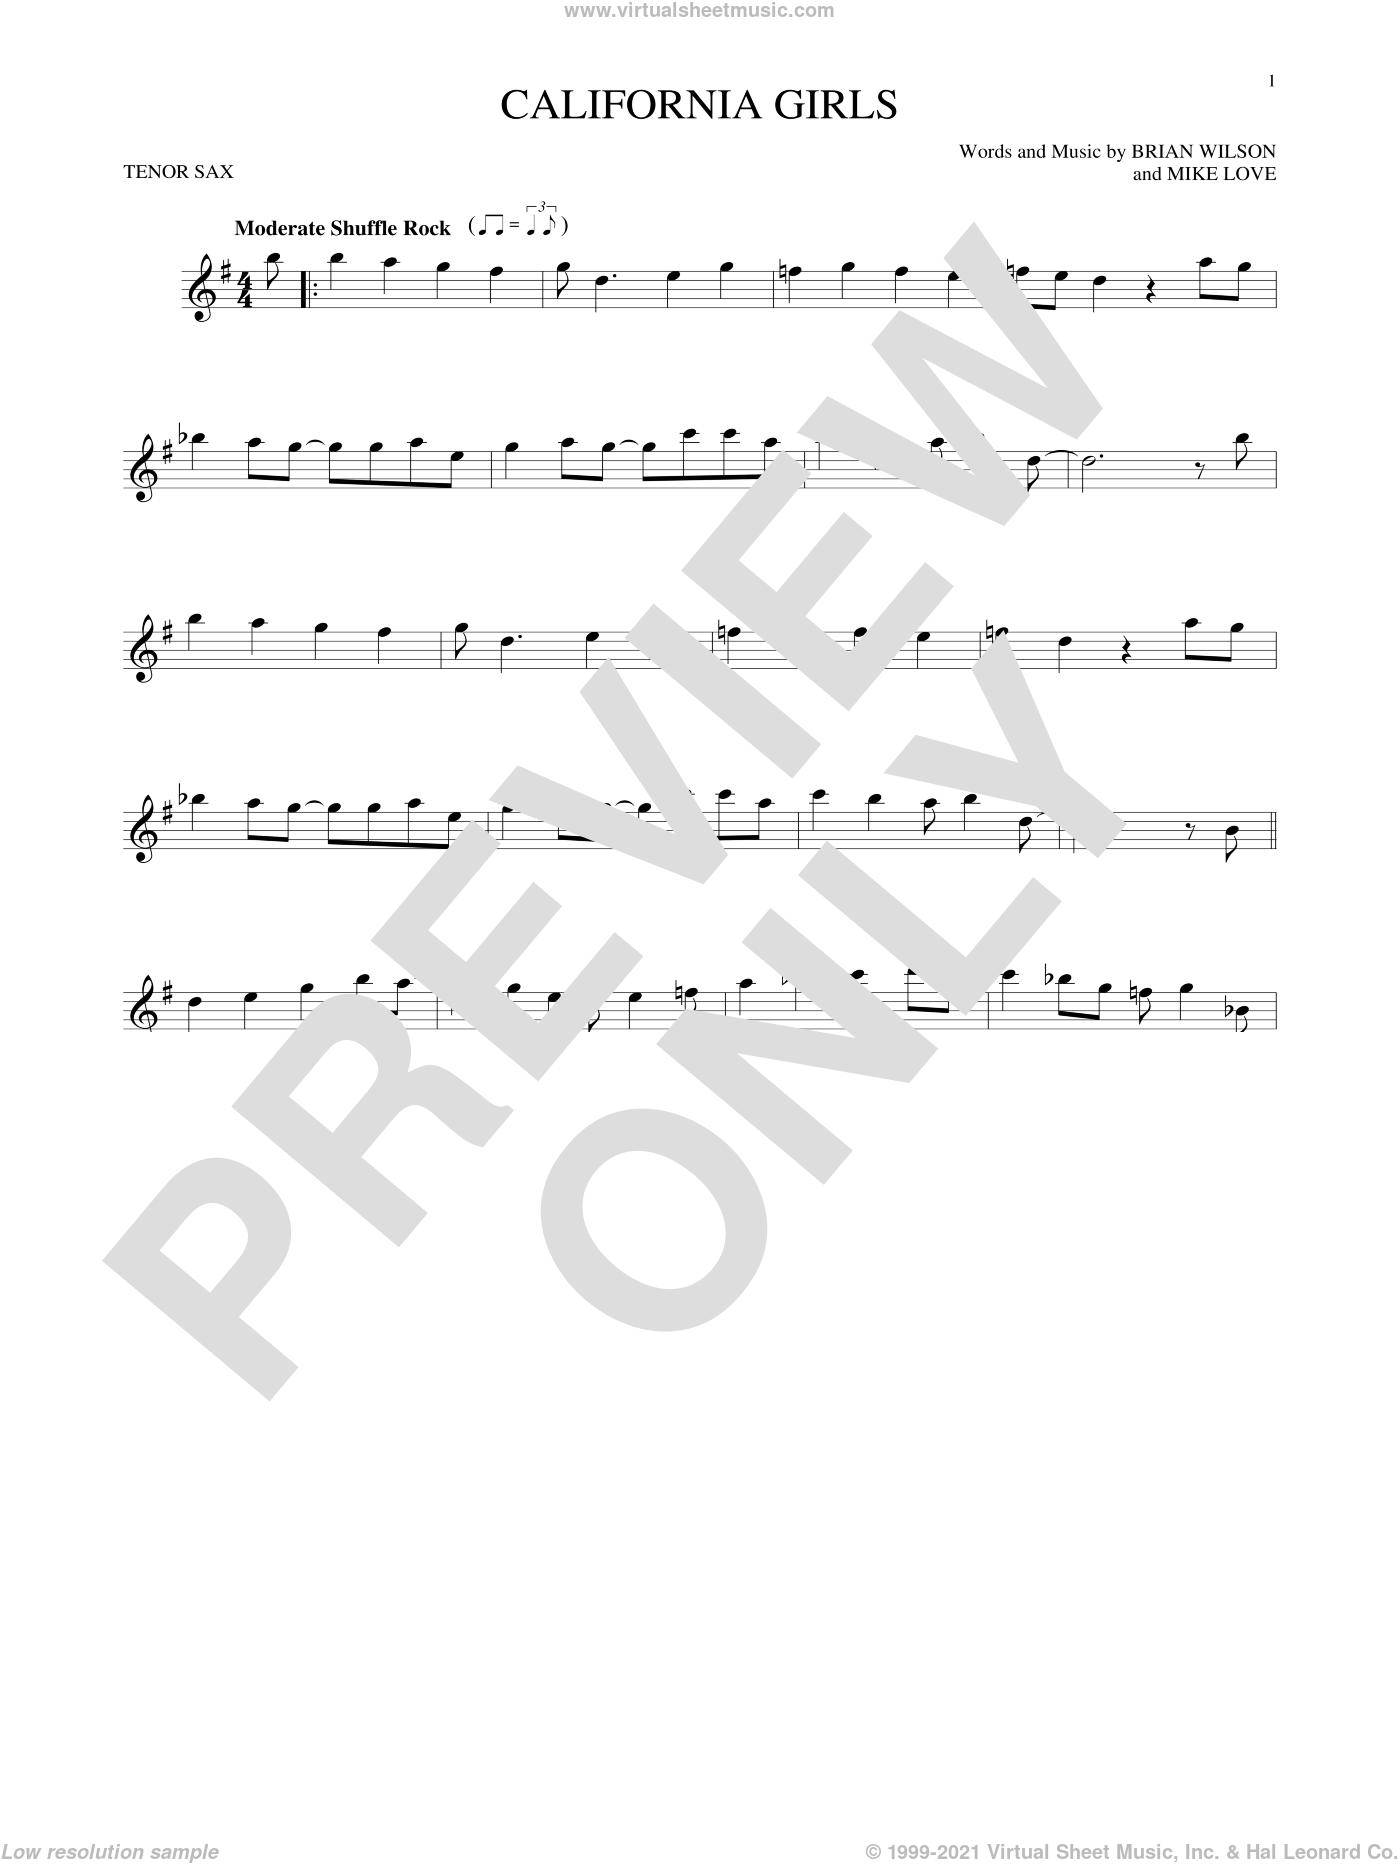 California Girls sheet music for tenor saxophone solo by The Beach Boys, David Lee Roth, Brian Wilson and Mike Love, intermediate skill level